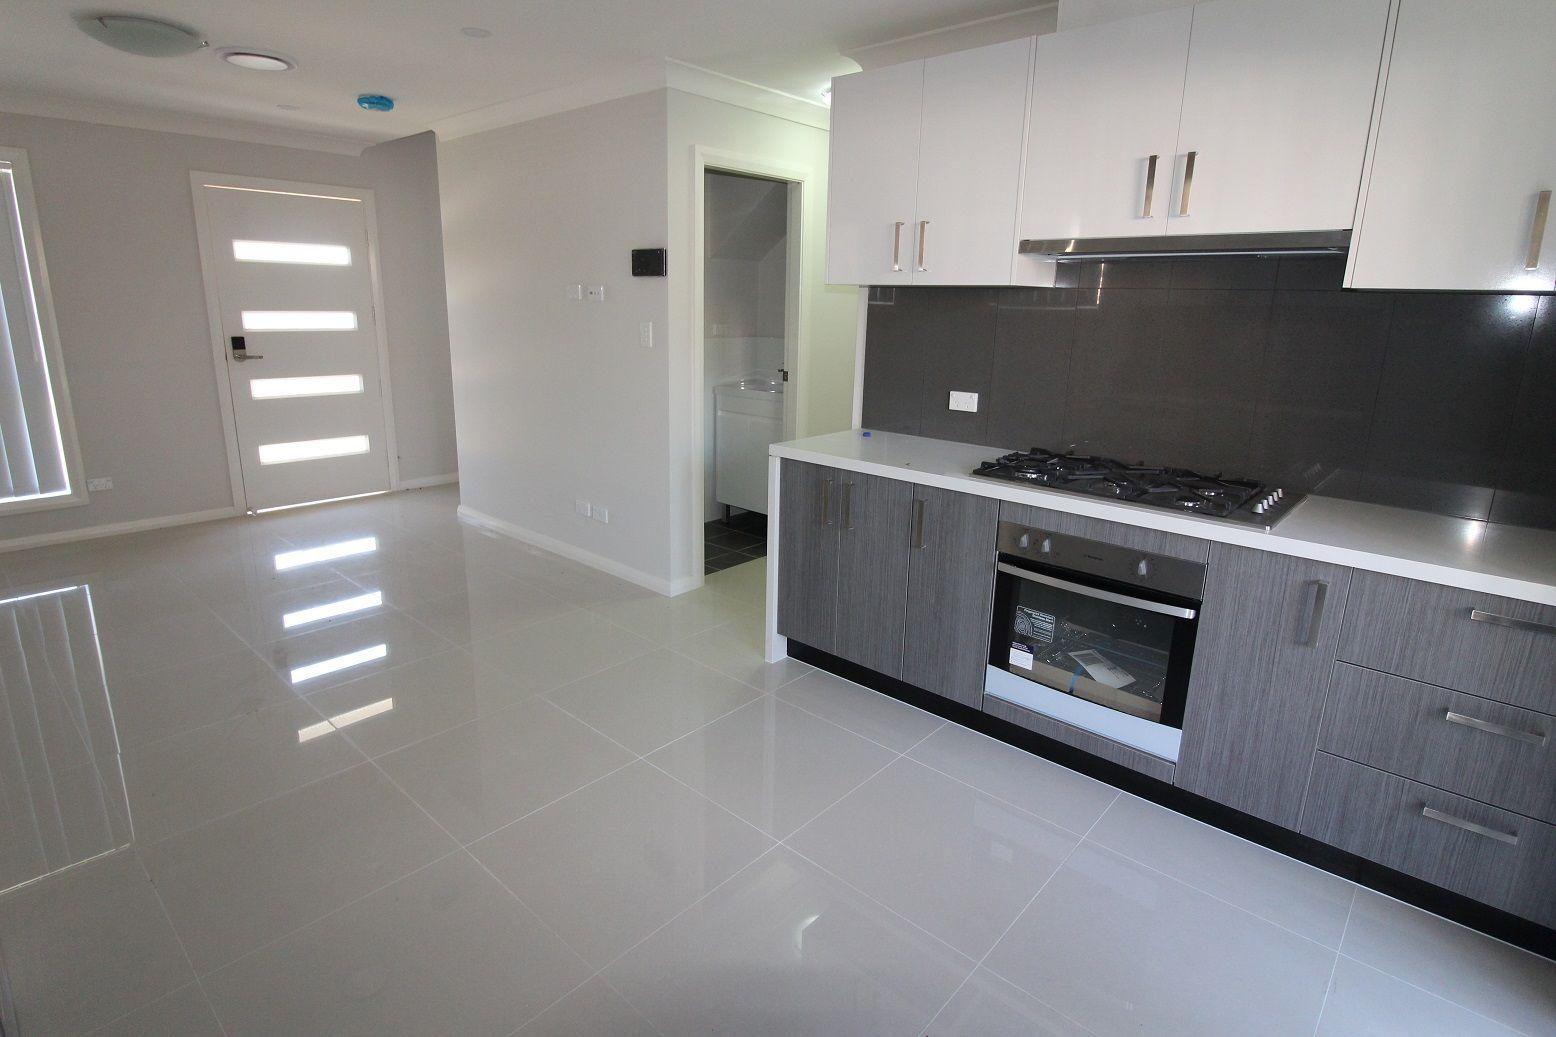 1/11 Booreea Street, Blacktown NSW 2148, Image 2